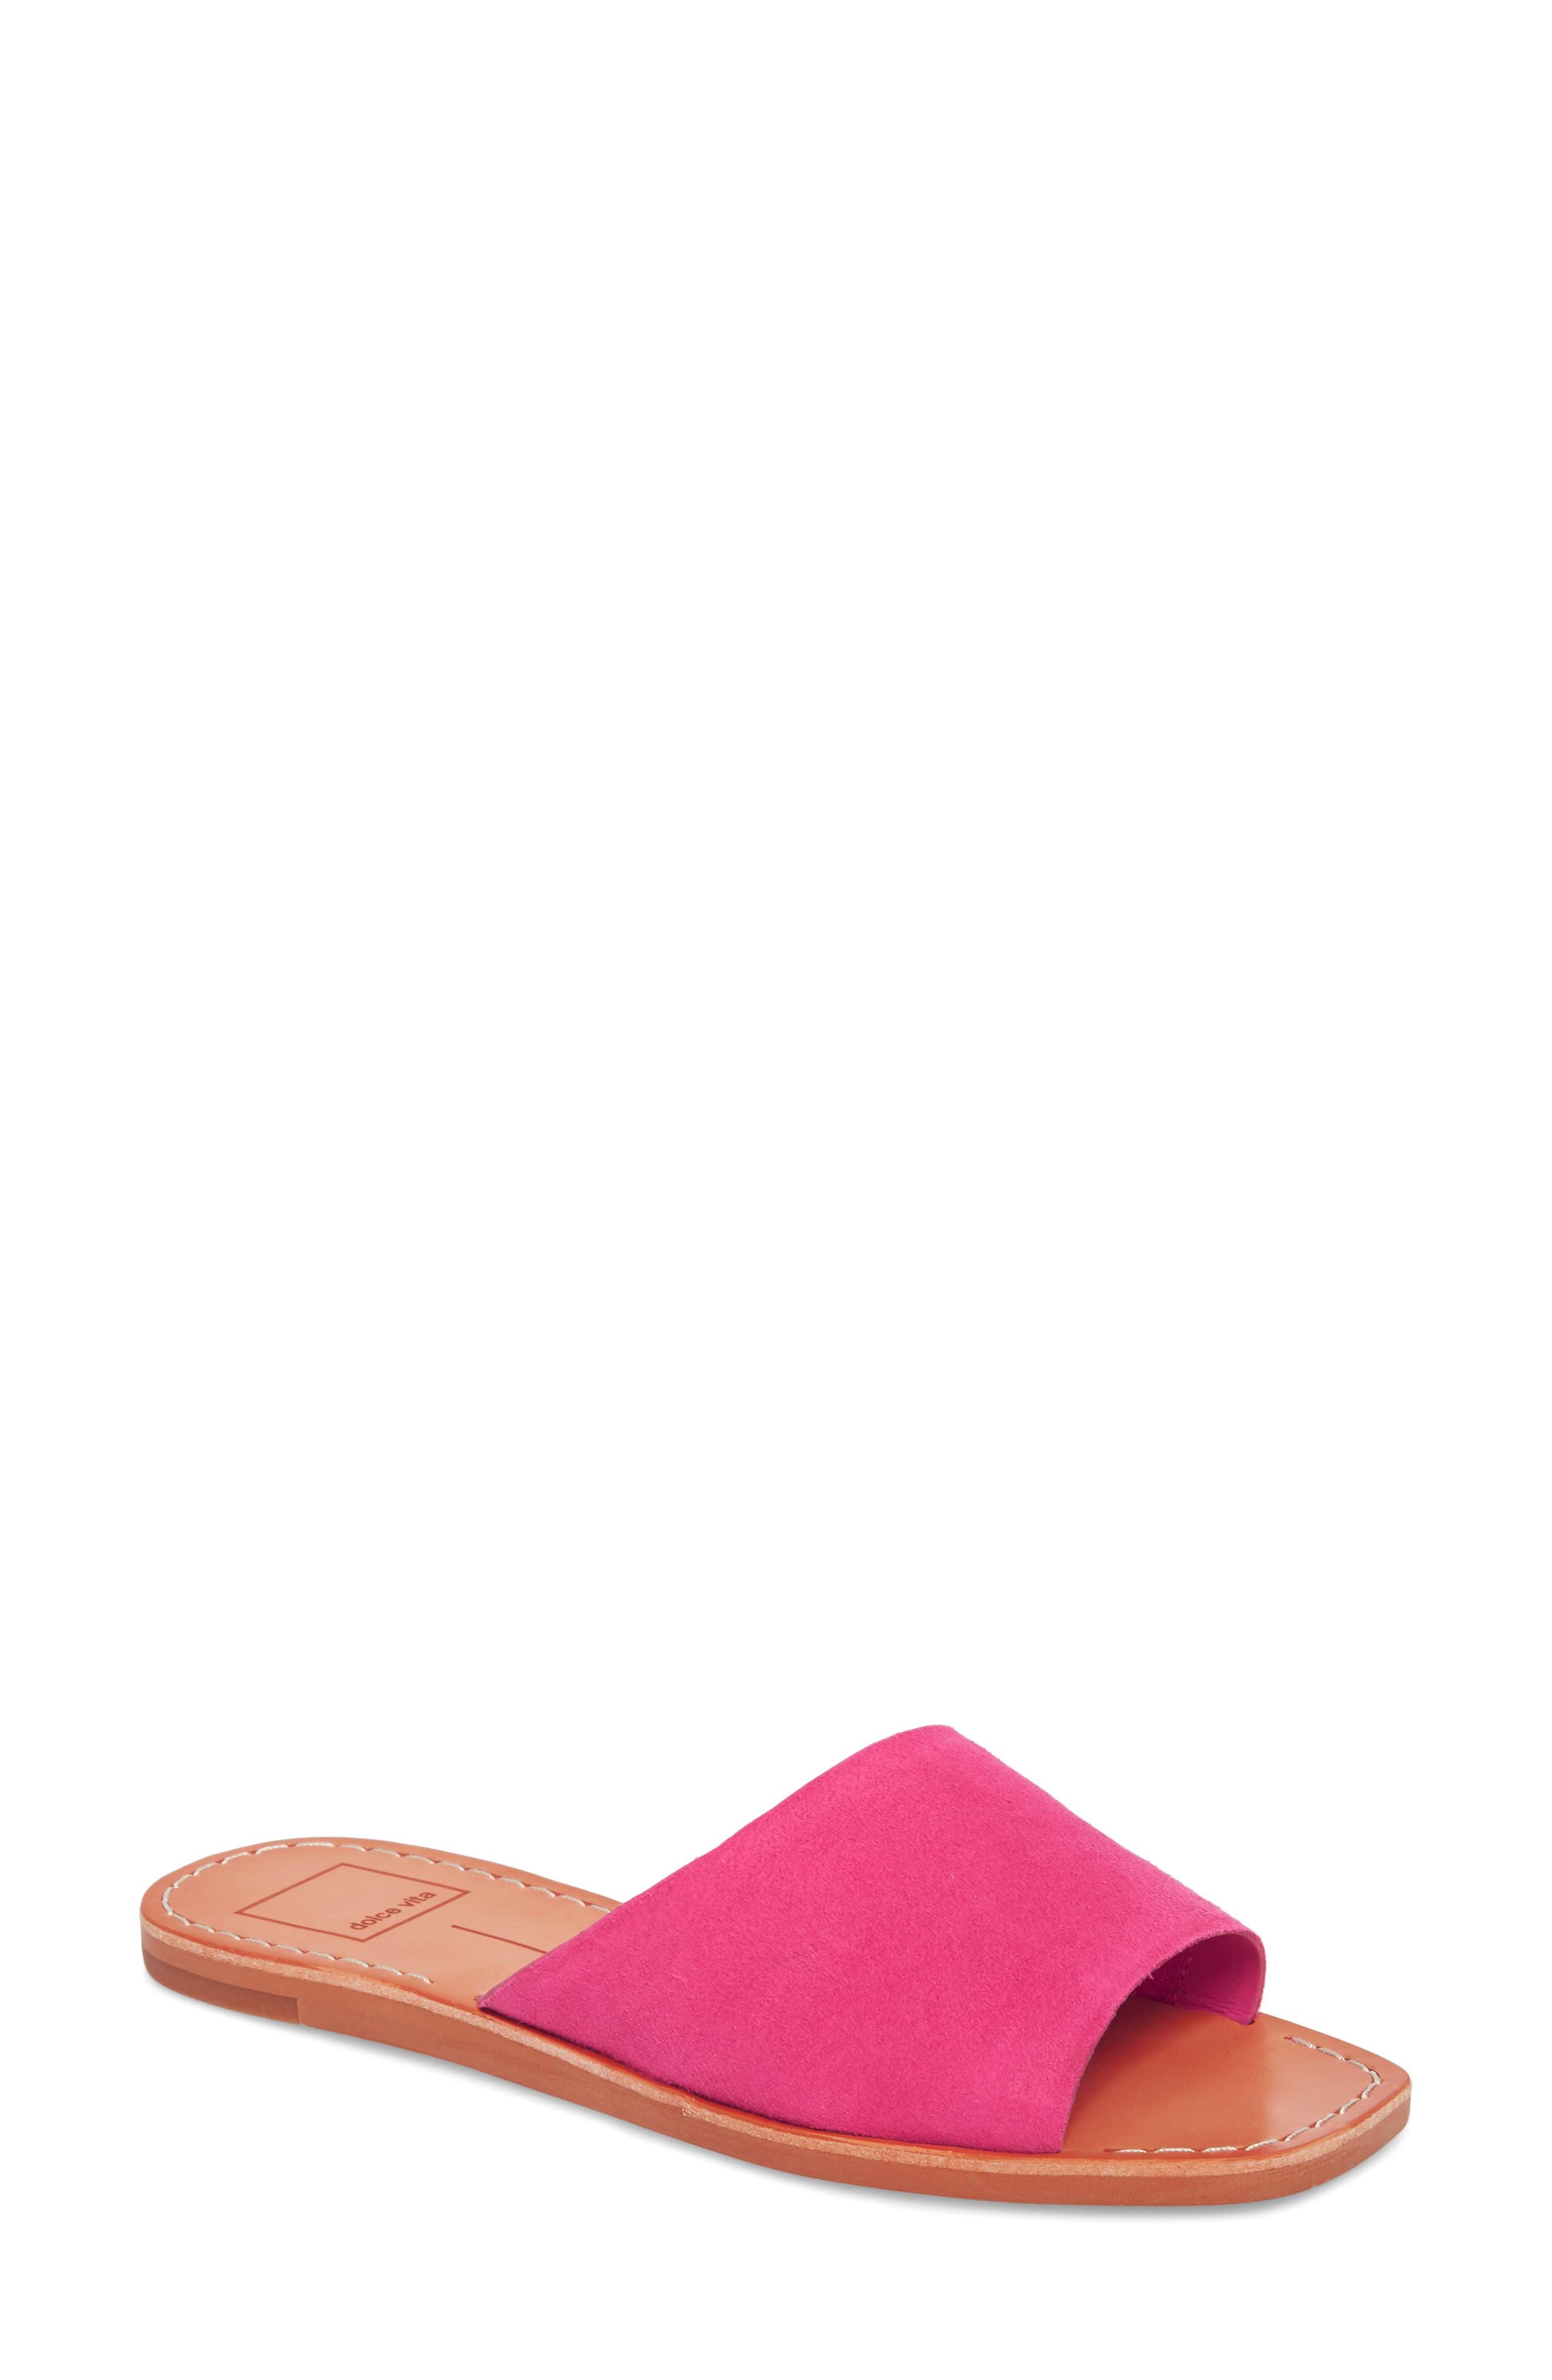 Cato Genuine Calf Hair Slide Sandal,                             Main thumbnail 5, color,